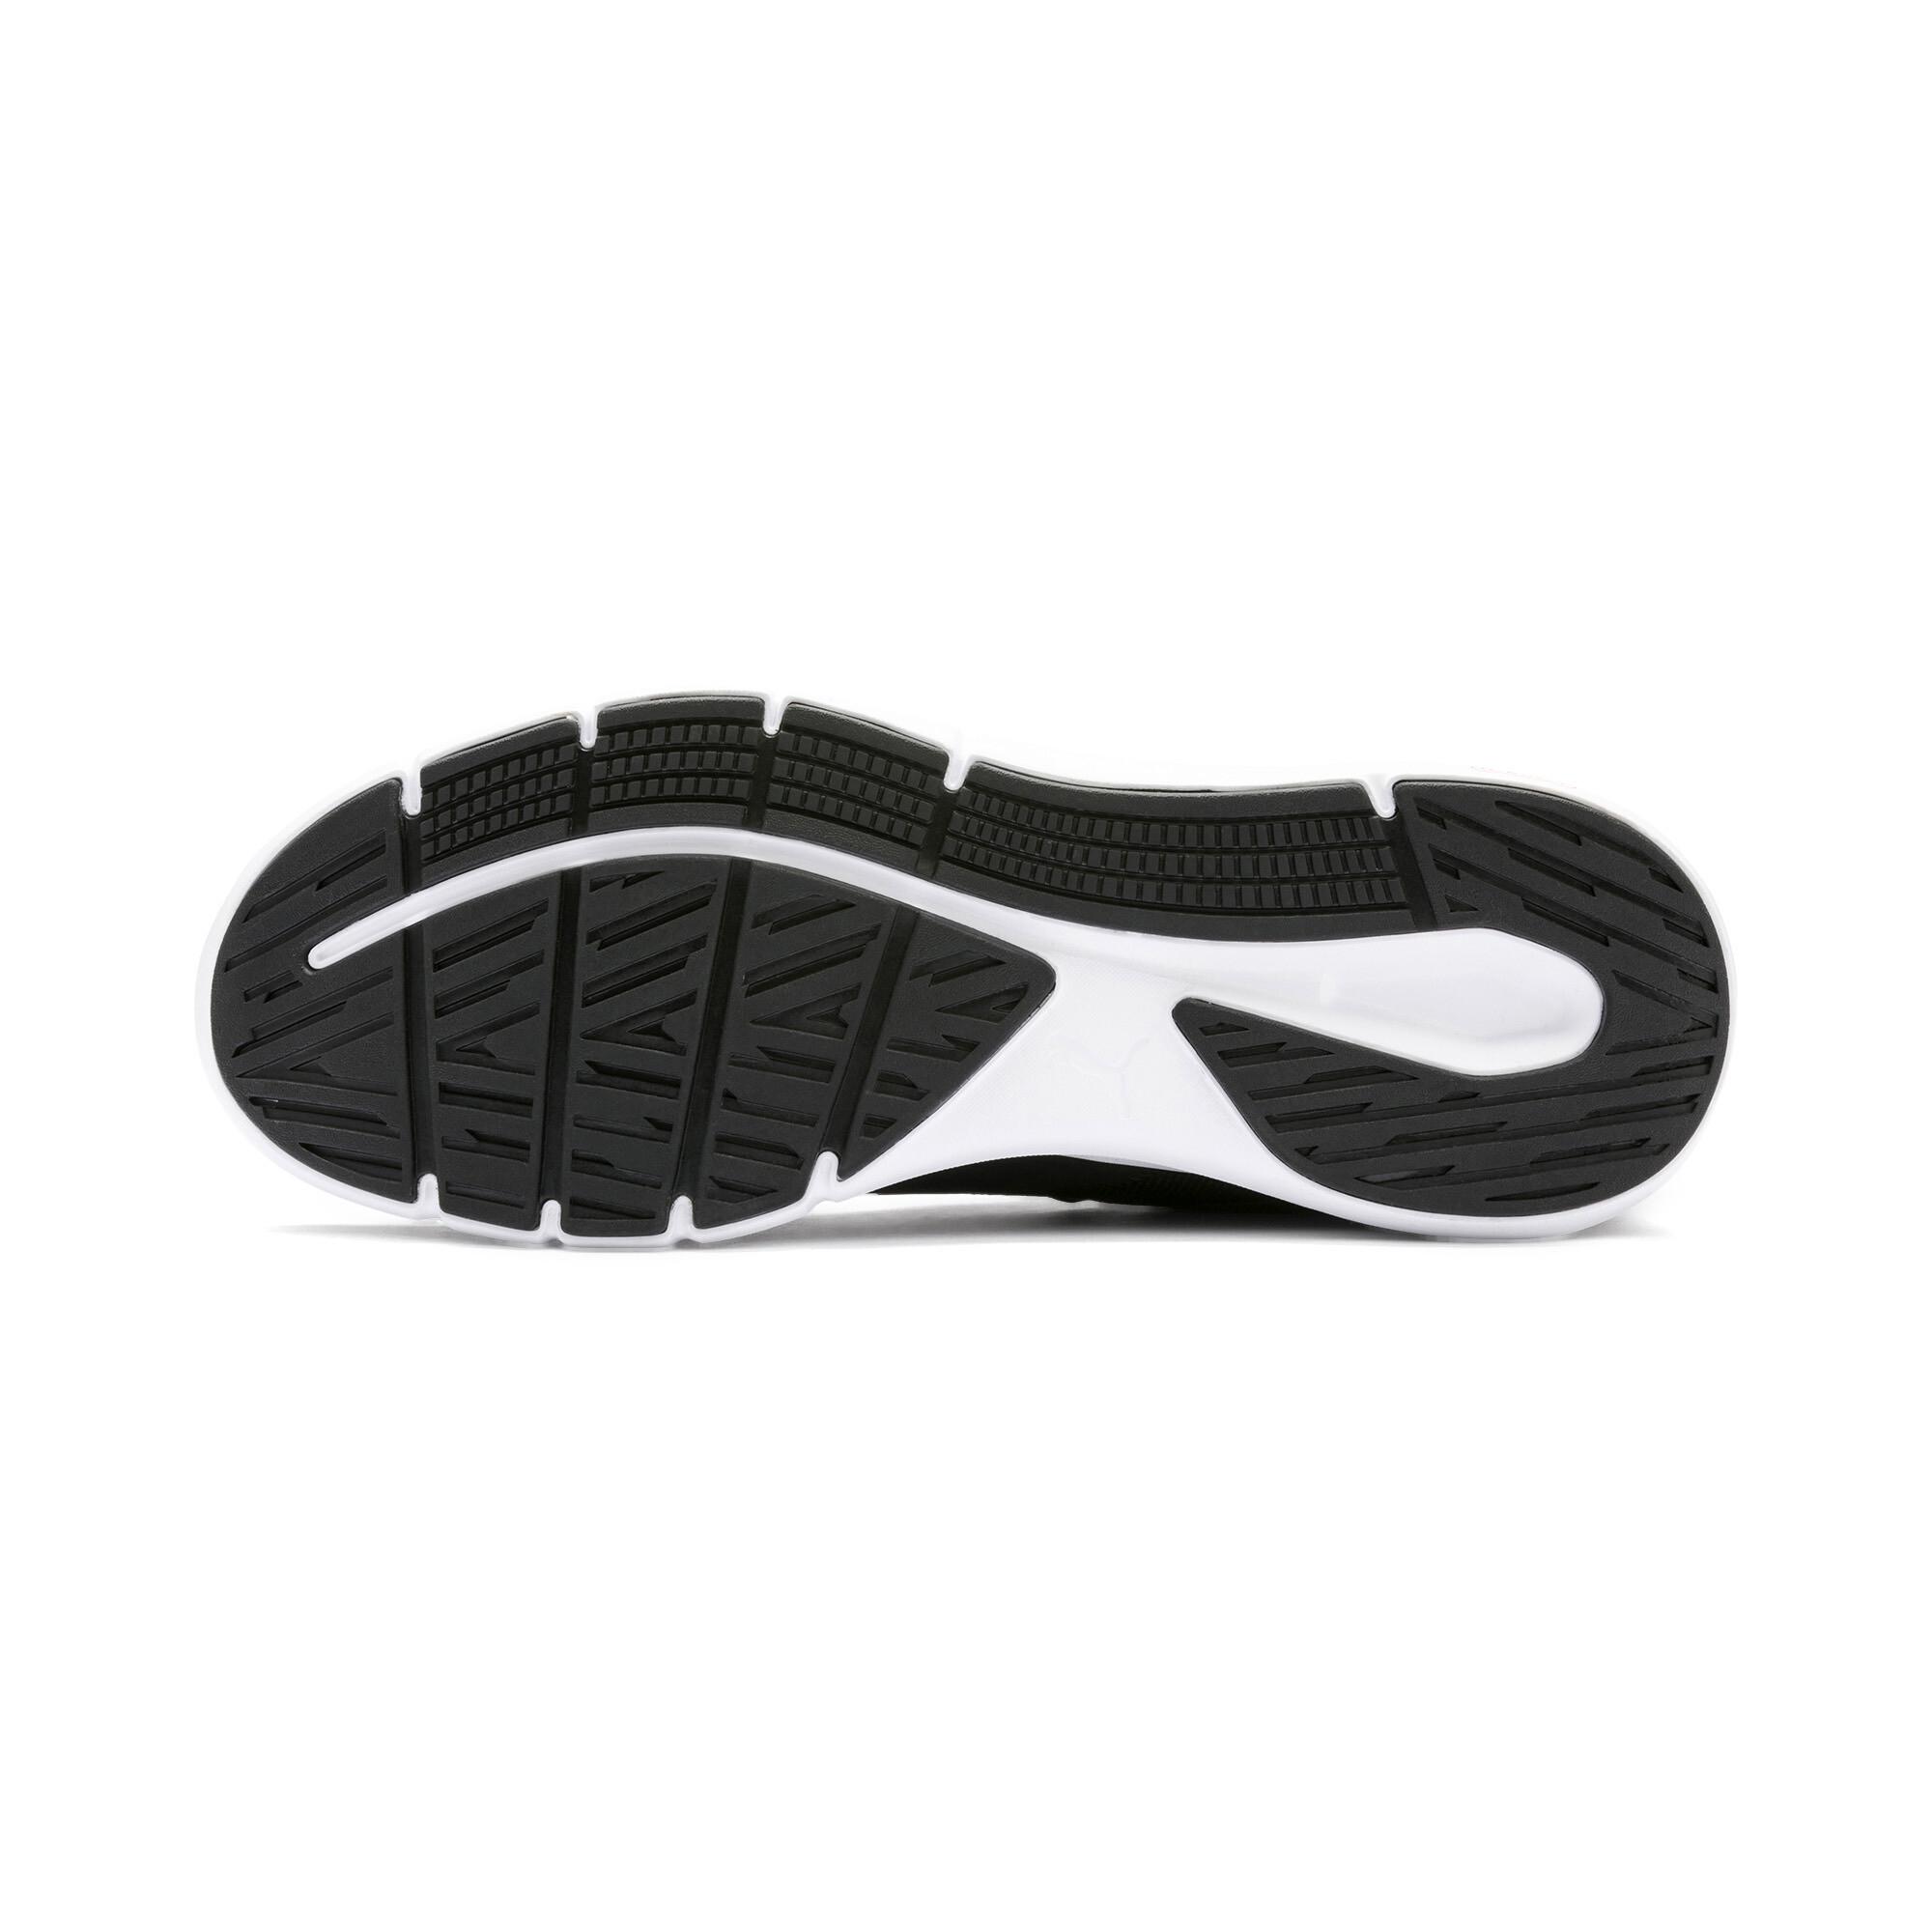 PUMA-NRGY-Dynamo-Futuro-Men-039-s-Running-Shoes-Men-Shoe-Running thumbnail 13